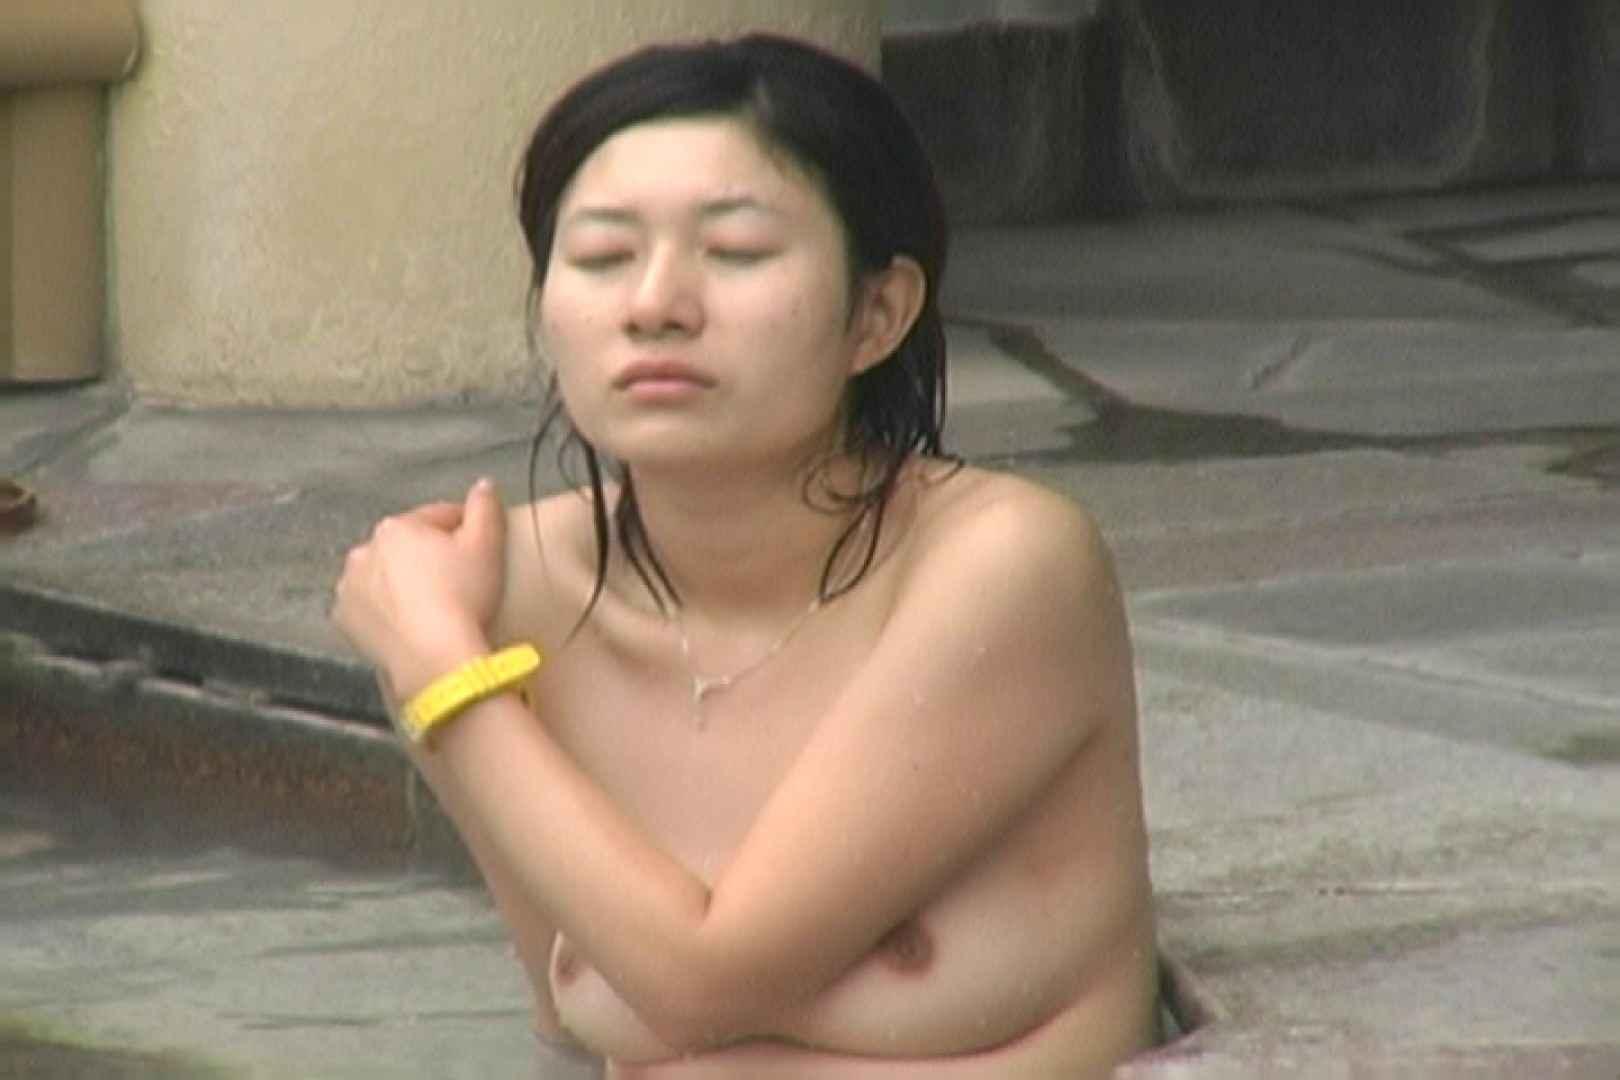 Aquaな露天風呂Vol.549 露天風呂突入 | 盗撮師作品  93pic 25